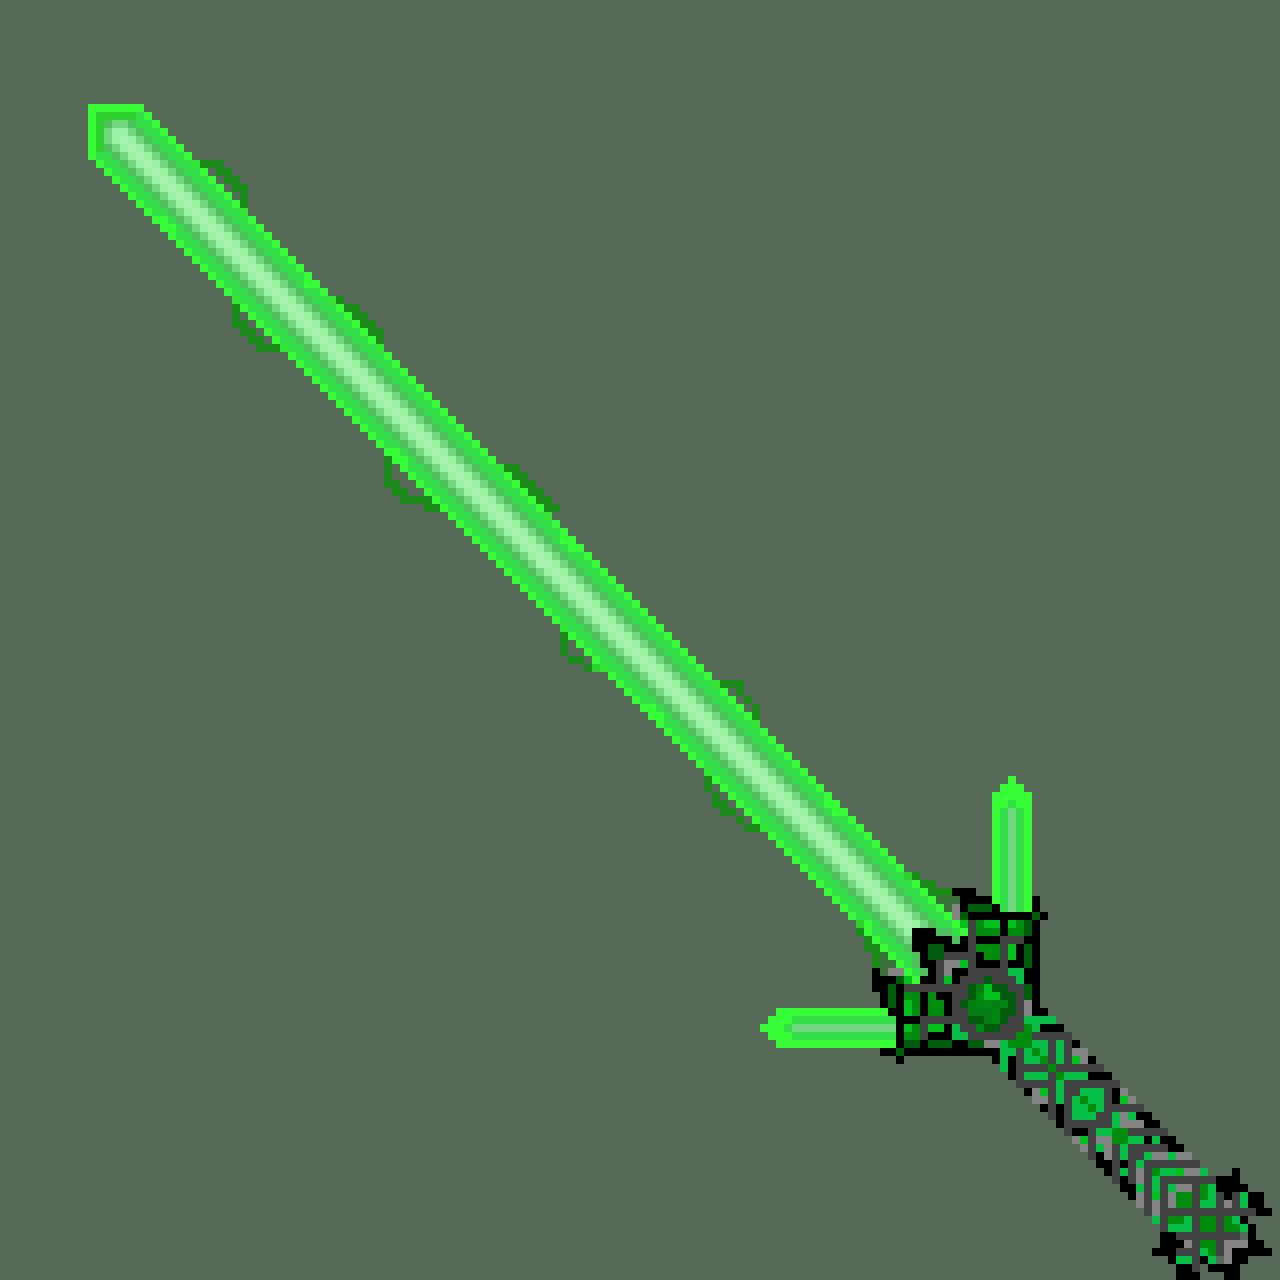 Green Sabor Sword